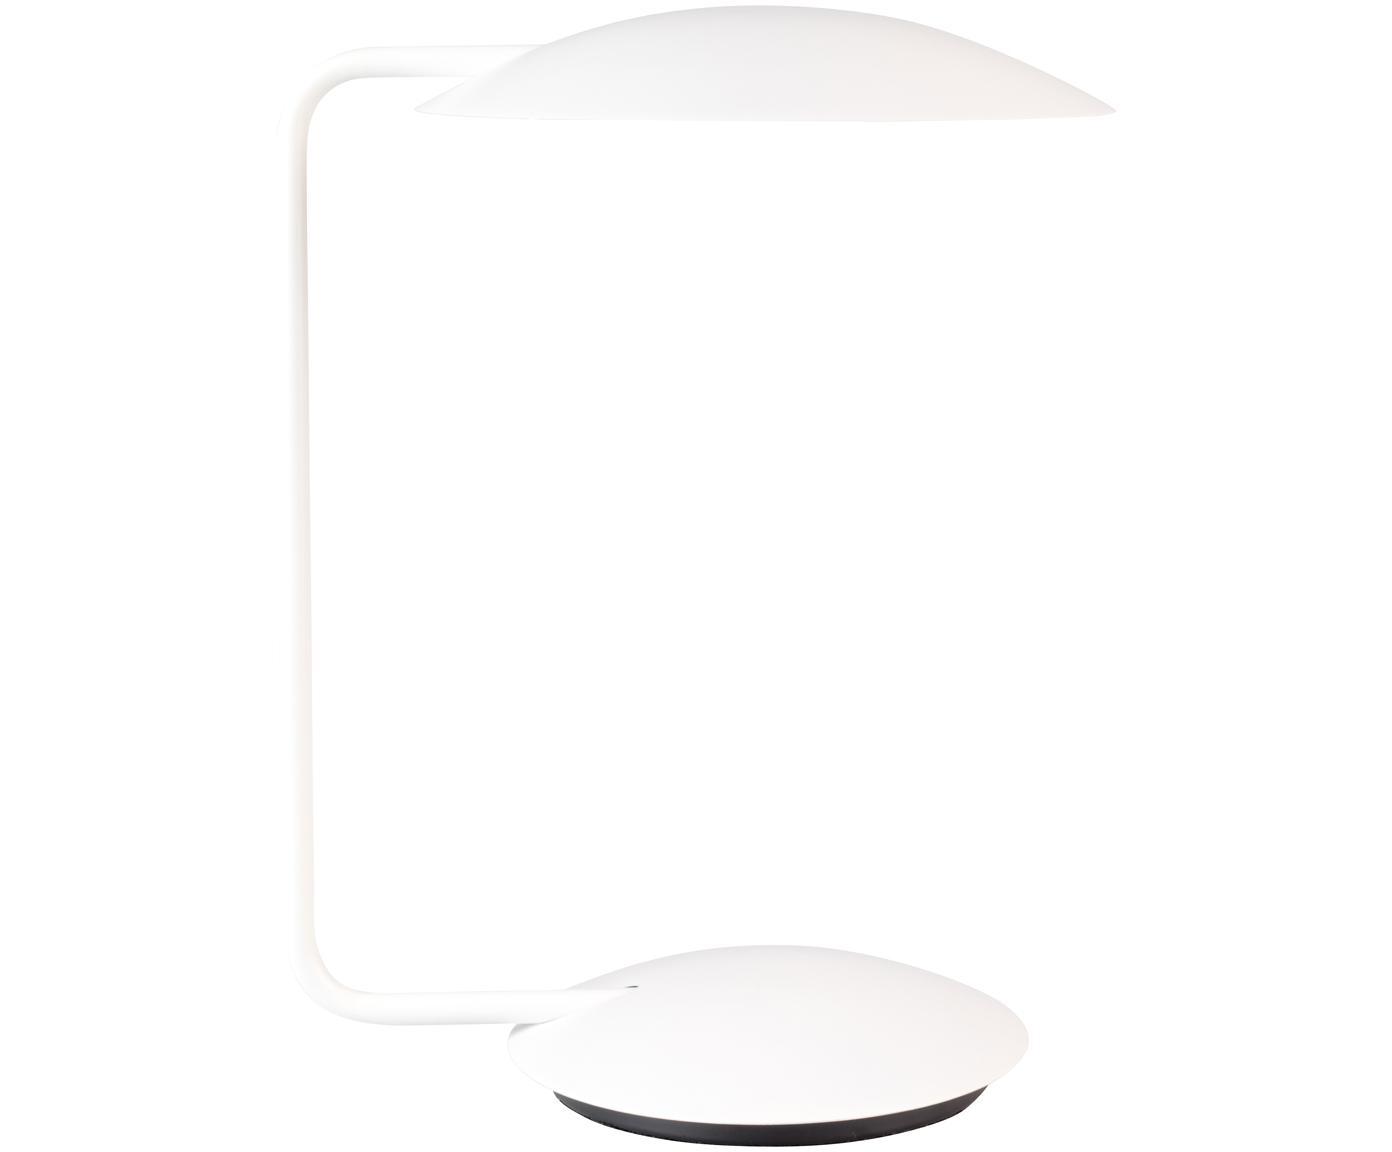 Lampada da tavolo dimmerabile Pixie, Bianco, Larg. 25 x Alt. 39 cm